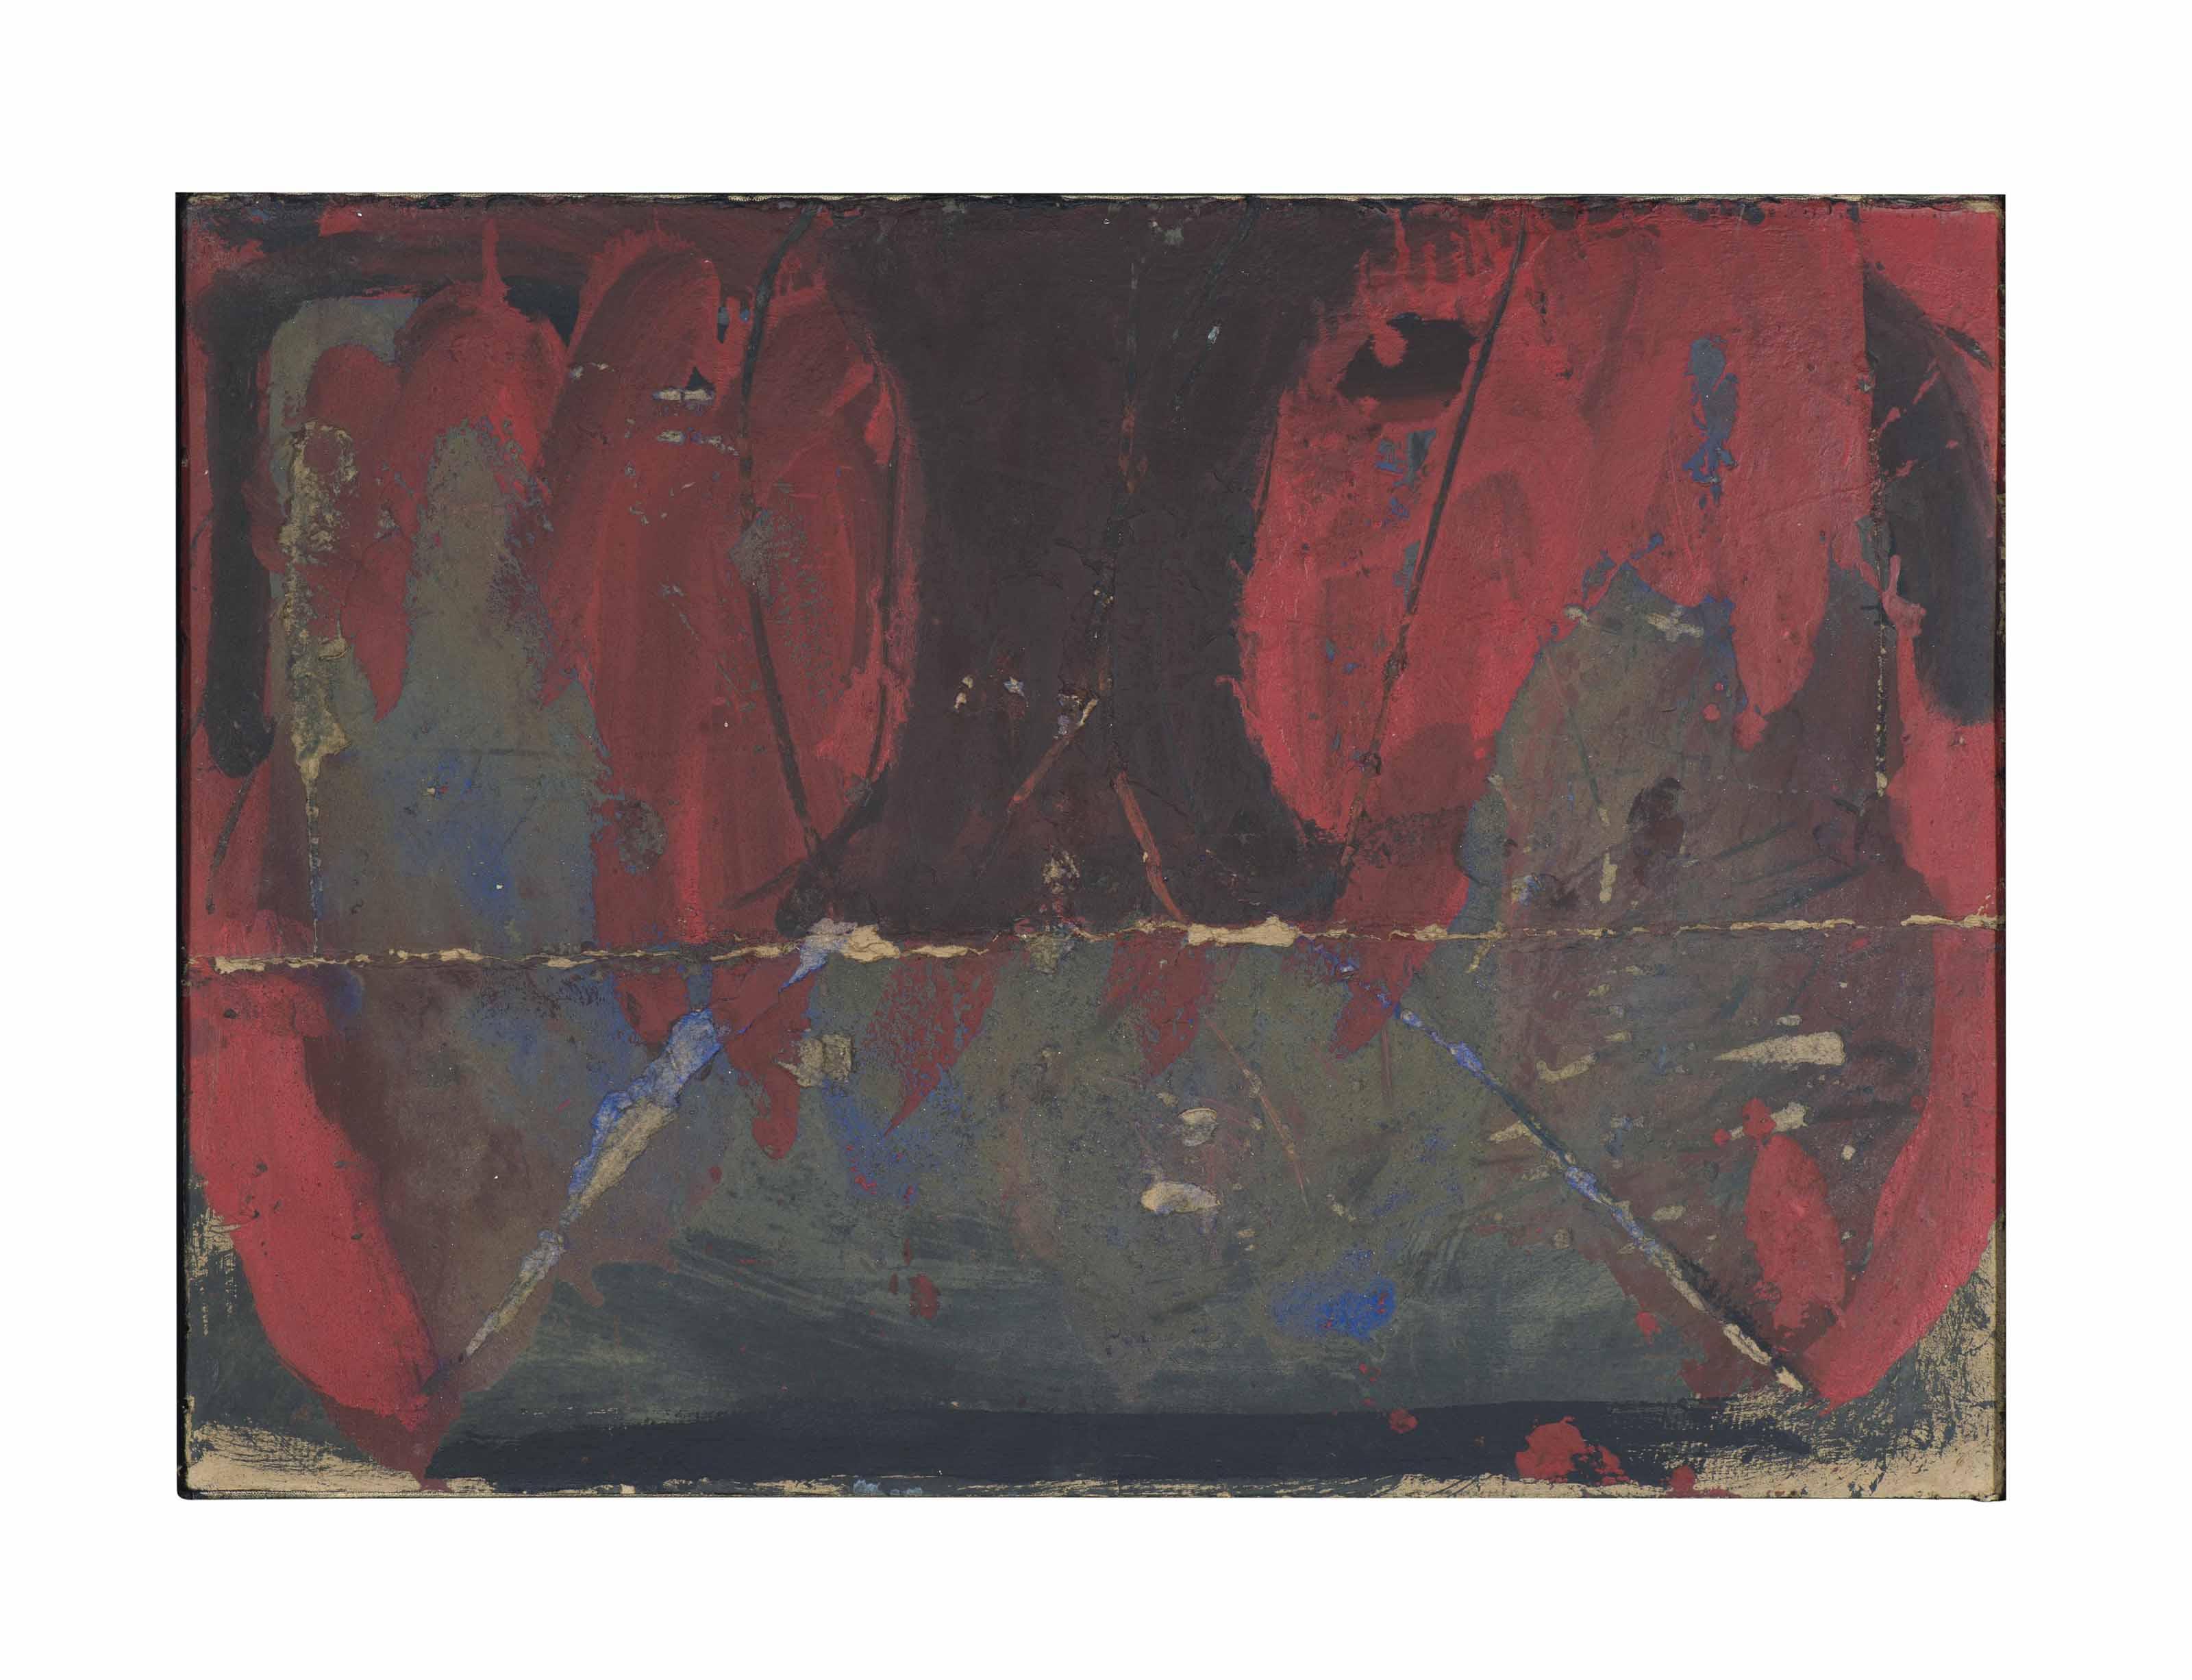 Pintura damunt cartó fregat (Painting on Scrubbed Cardboard)